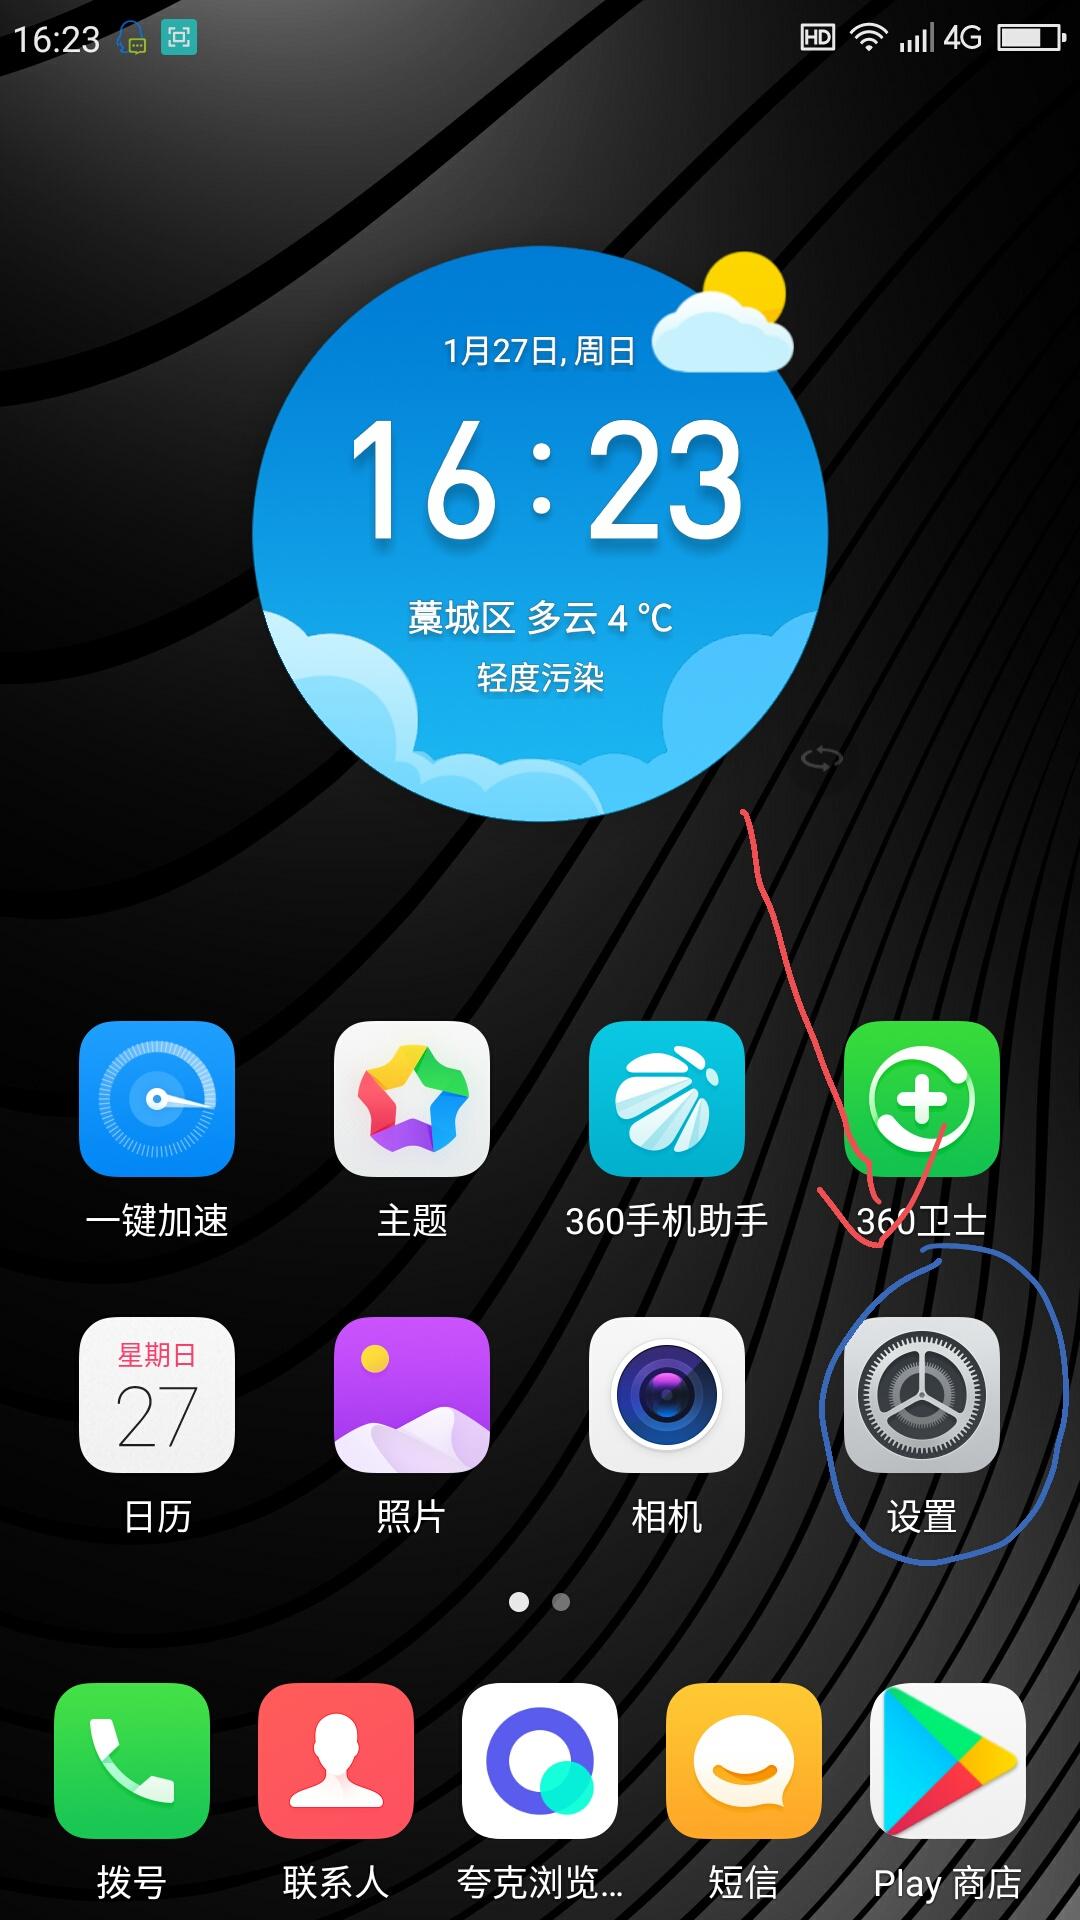 IMG_20190127_162348.jpg